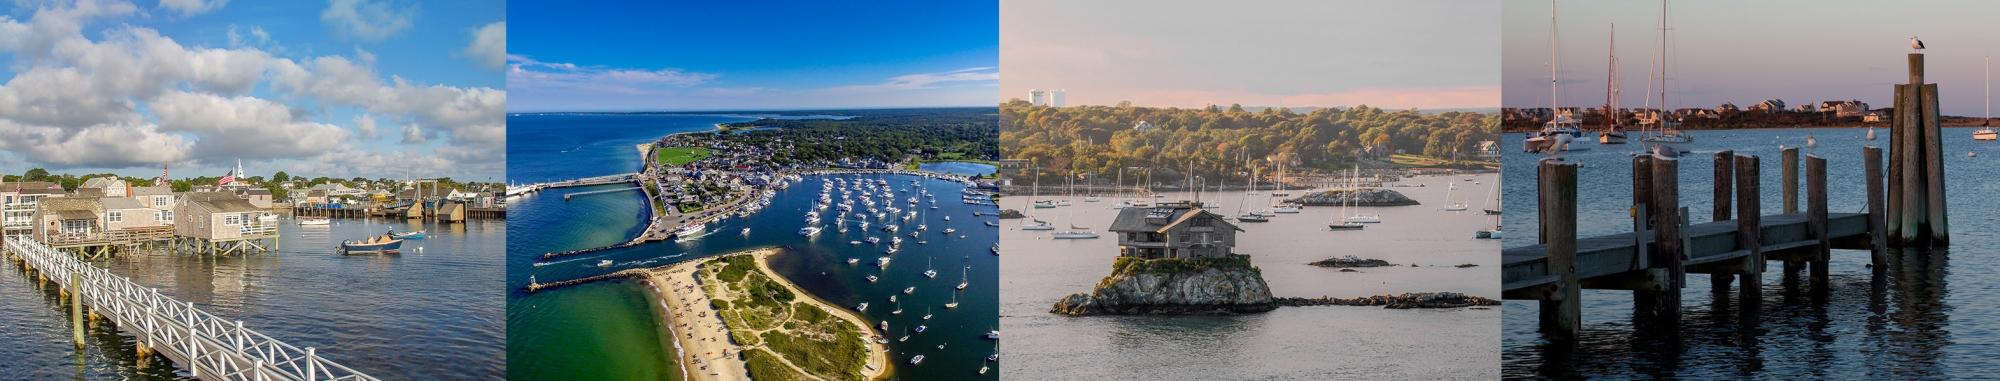 Newport (RI) Bareboat Charter Sailboats and Catamarans Rental Navtours